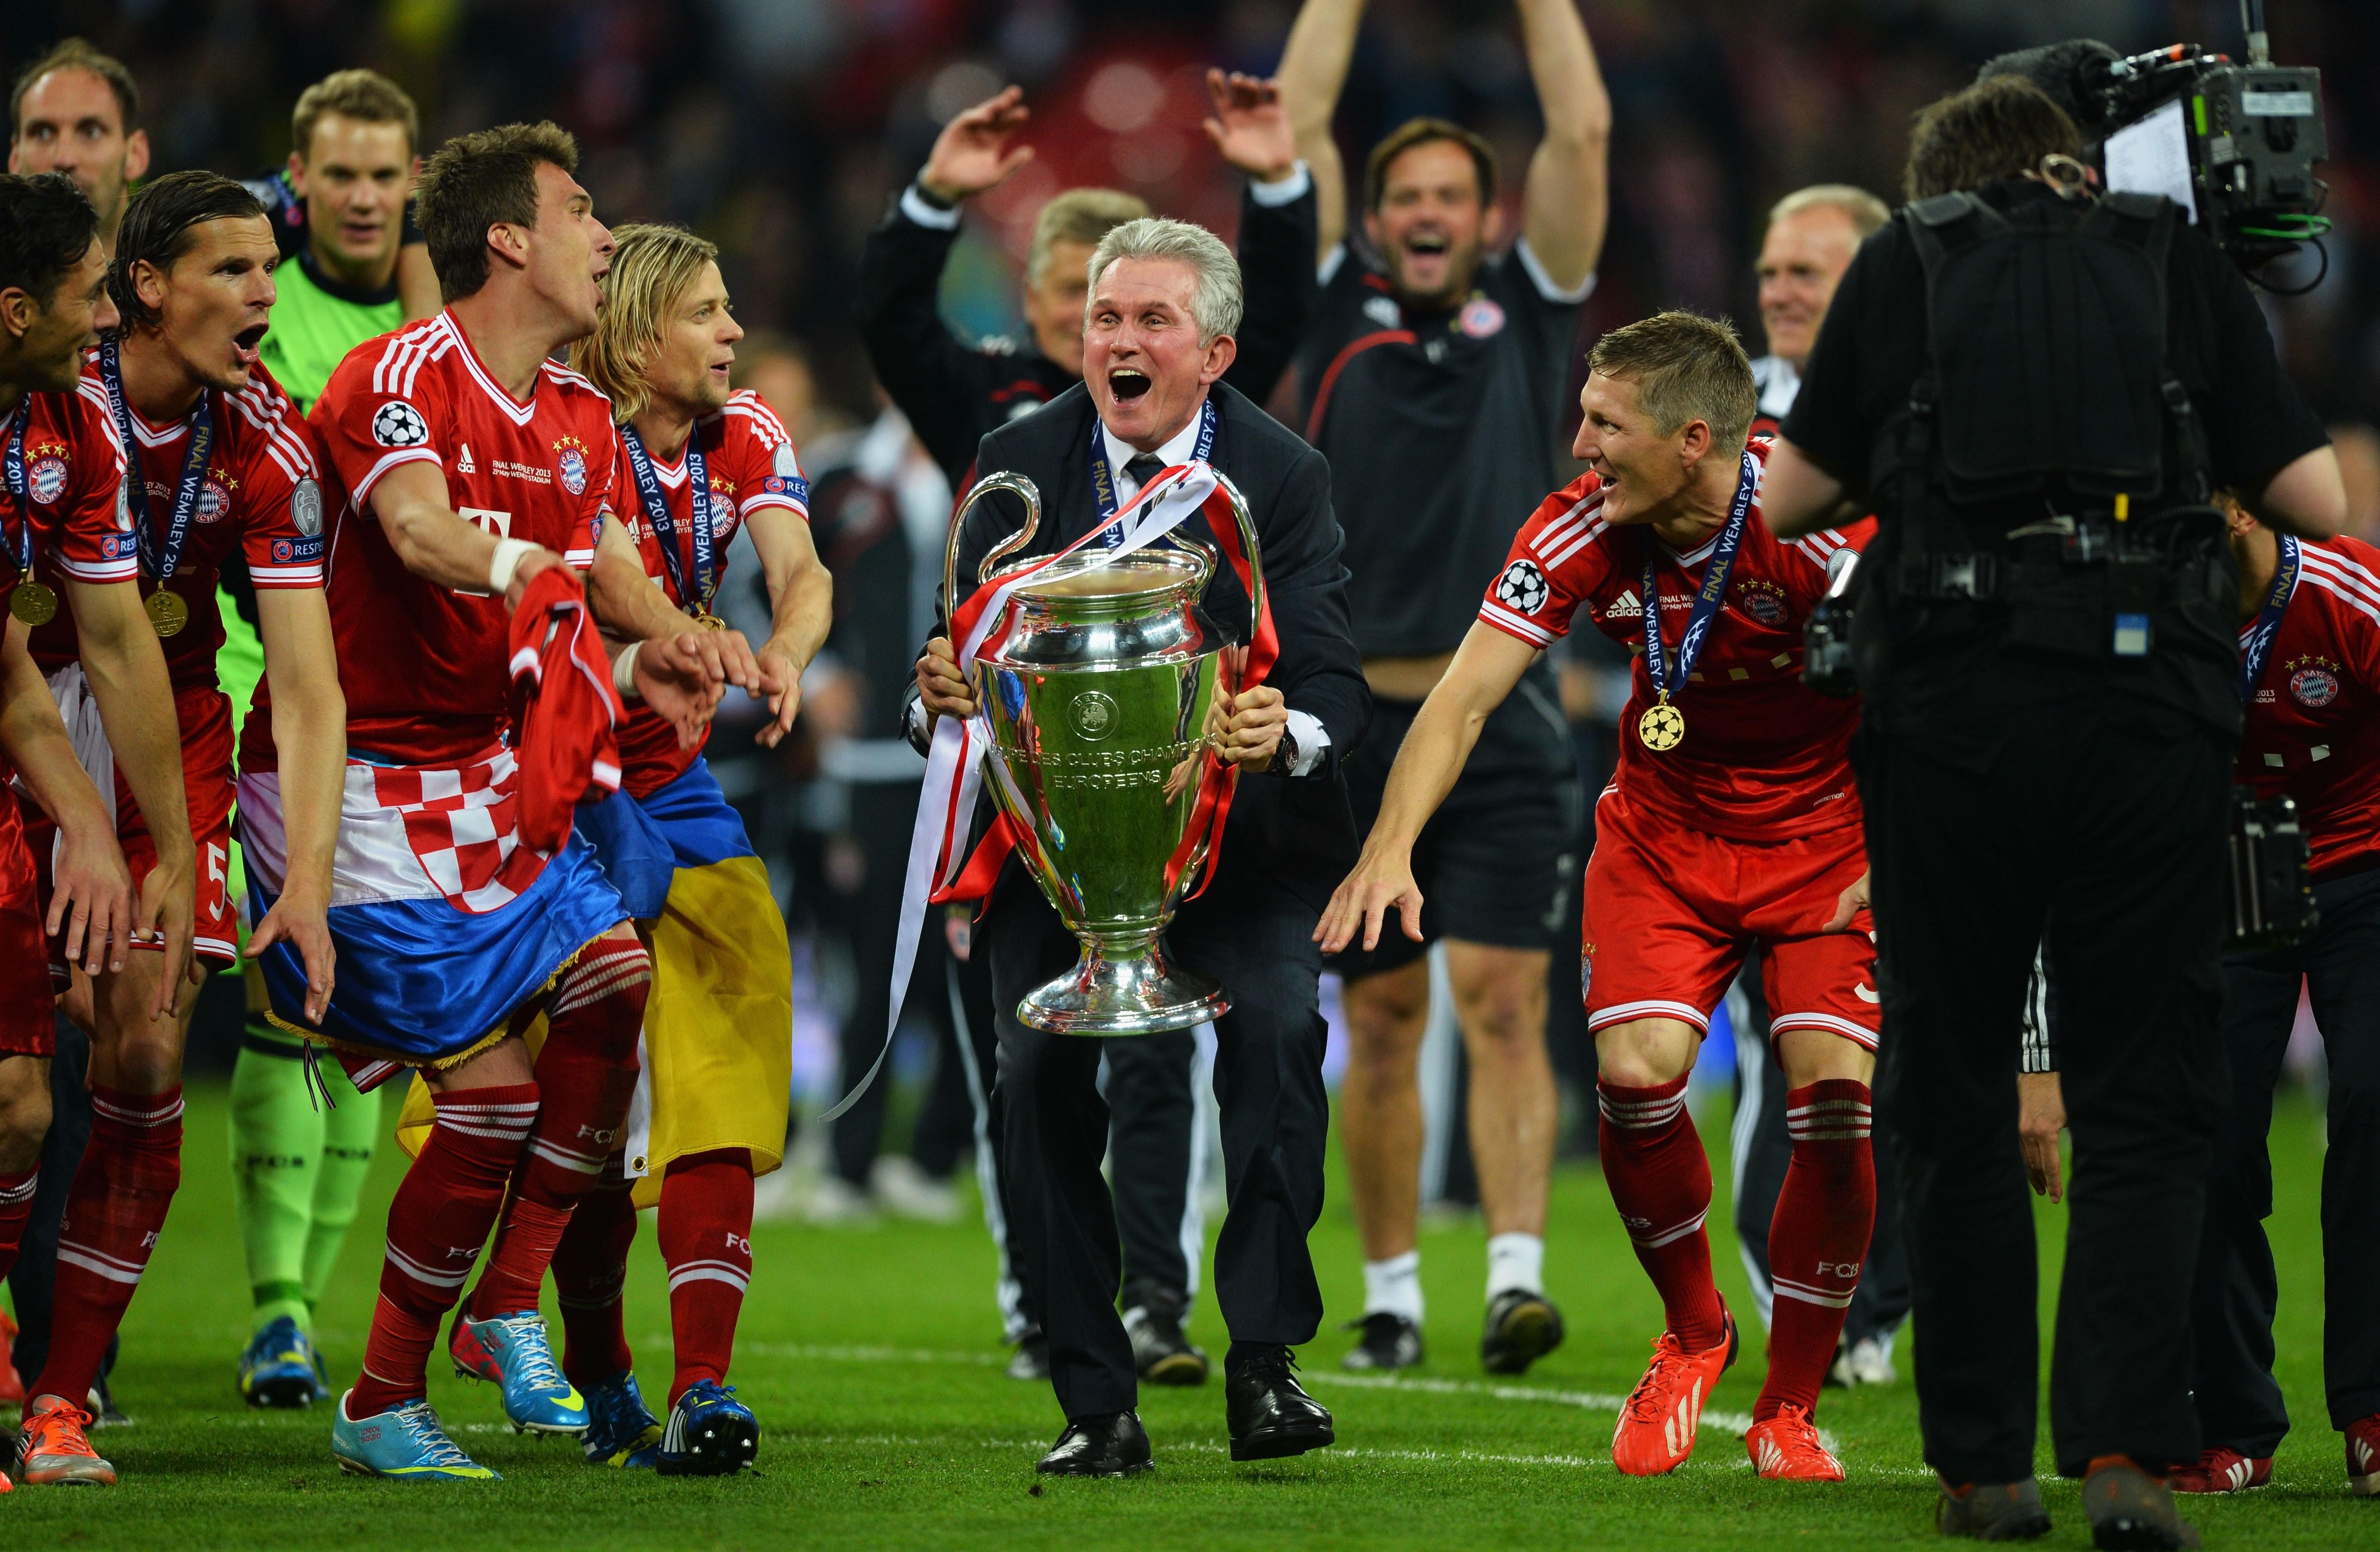 Borussia-Dortmund-v-FC-Bayern-Muenchen-UEFA-Champions-League-Final-1573633399.jpg